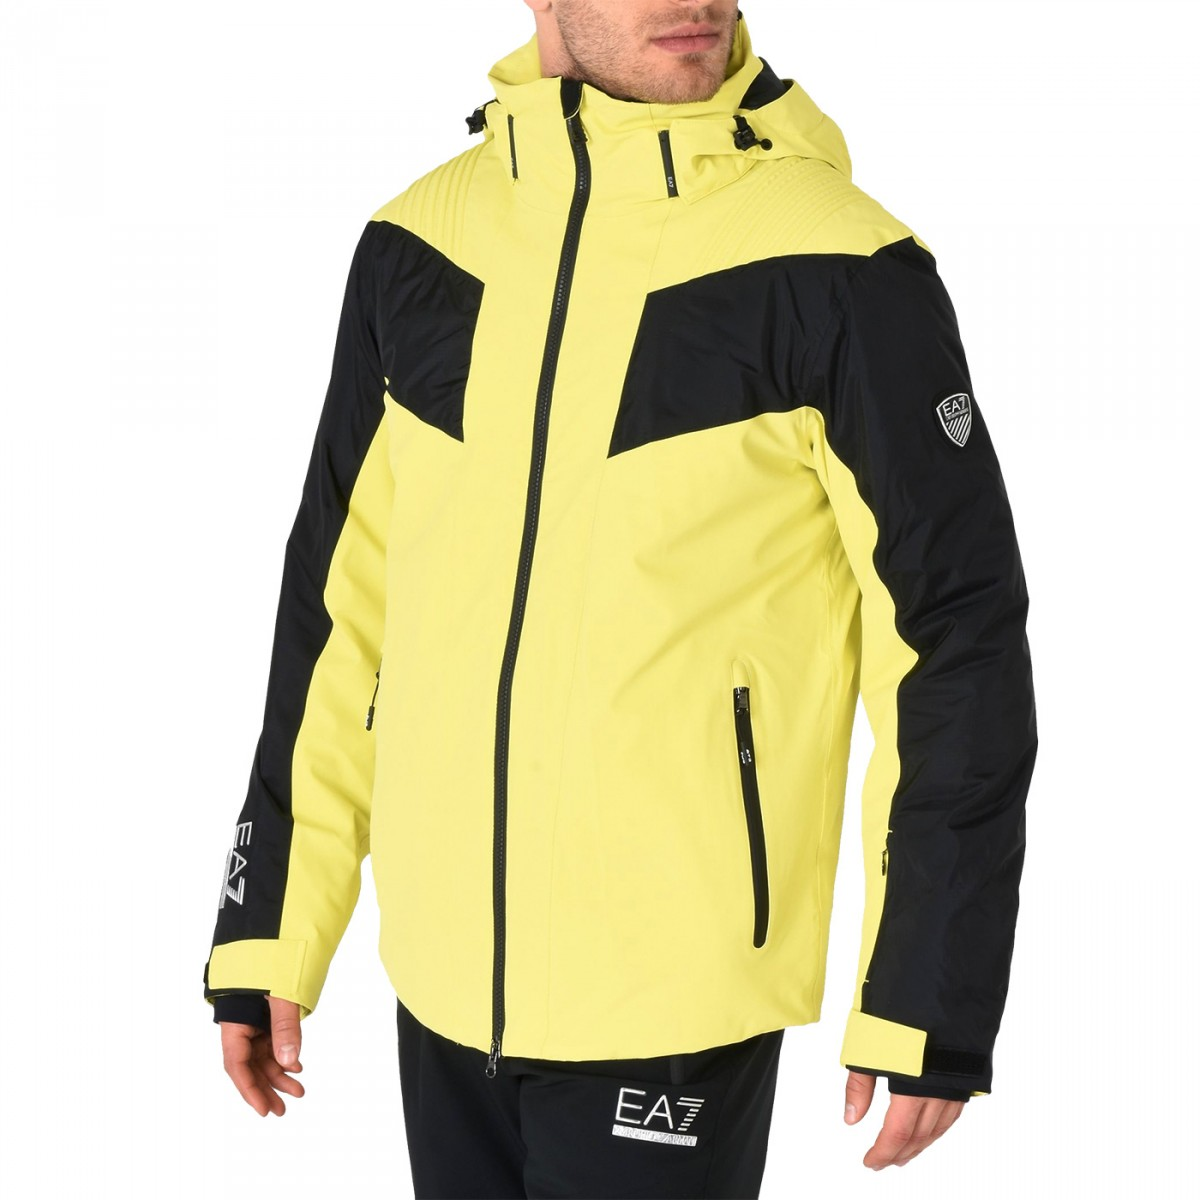 Gsou nieve camuflaje chaquetas de snowboard traje de esquí